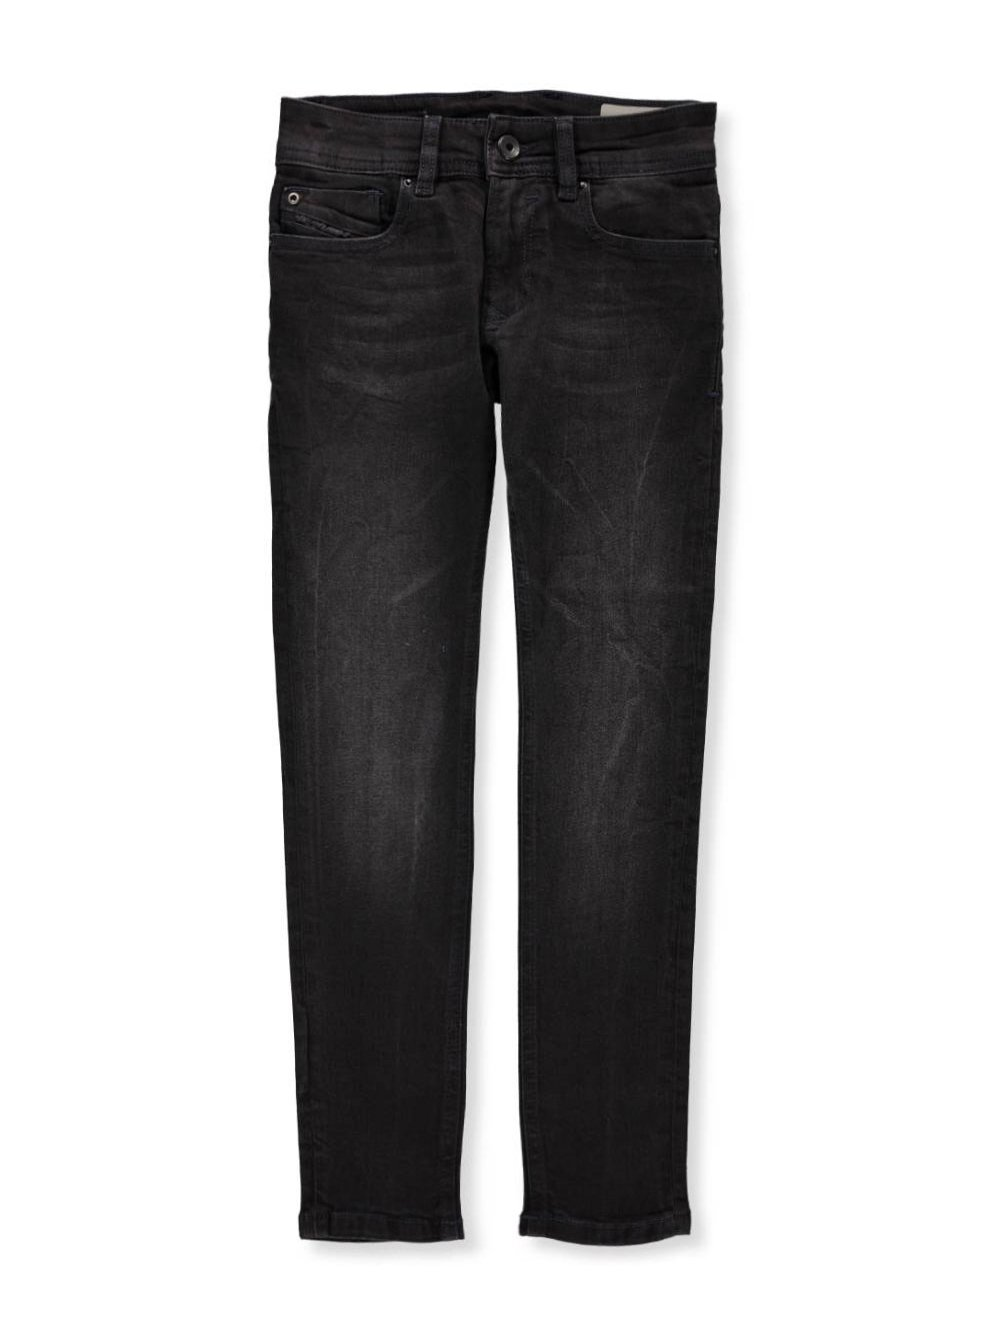 19df3a4c7c5 Cheap Zathan Diesel Jeans, find Zathan Diesel Jeans deals on line at ...